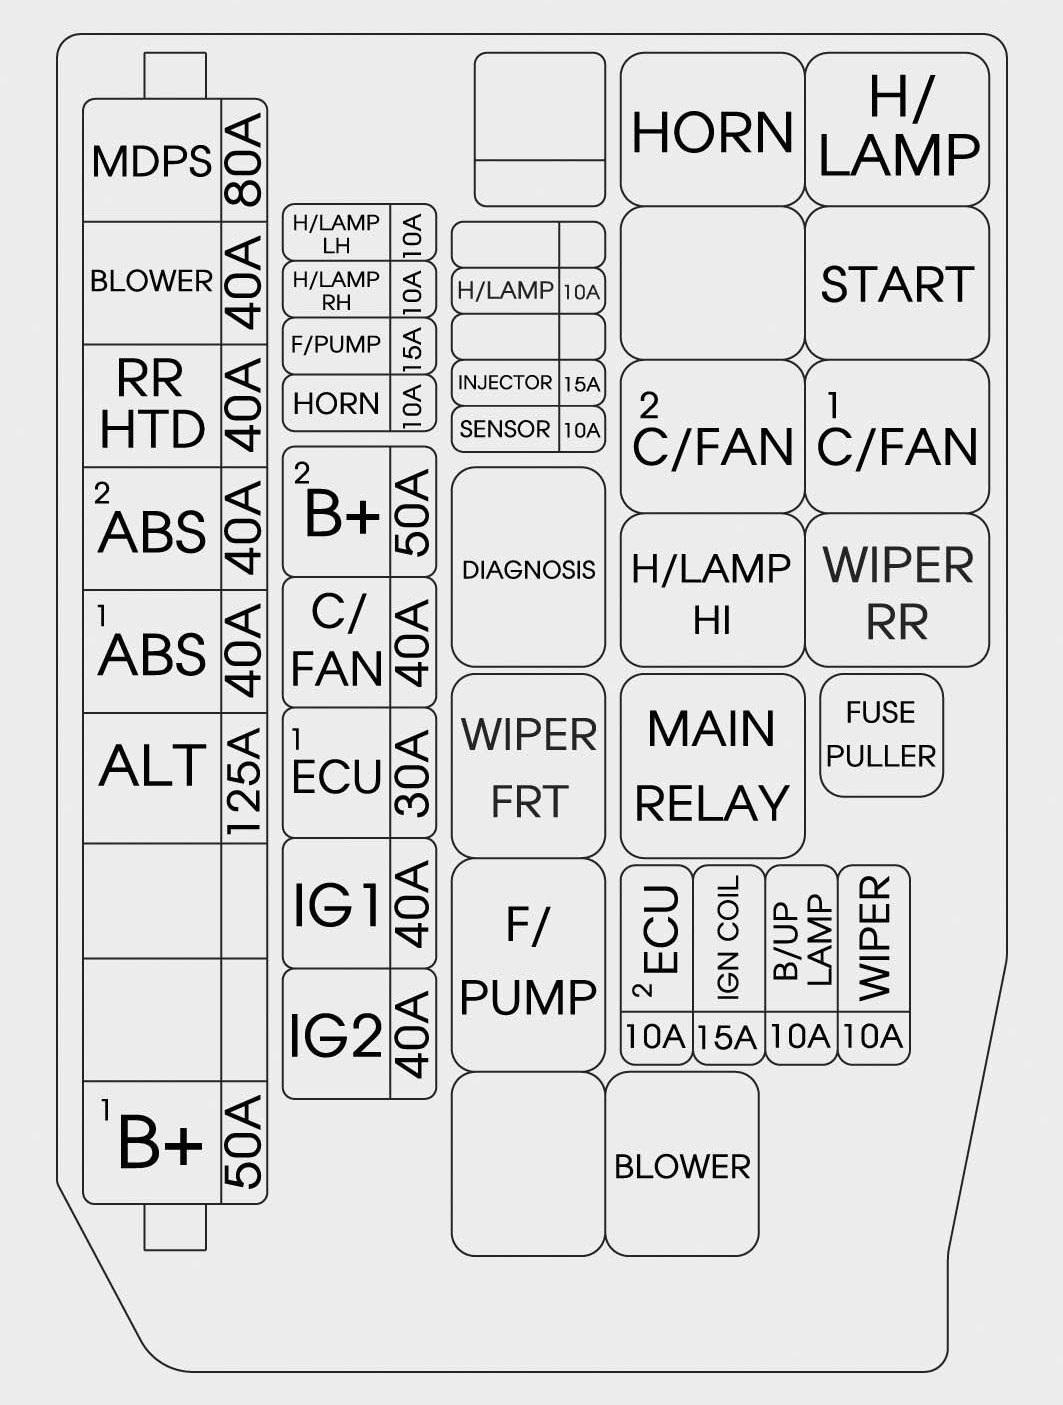 Hyundai Entourage Fuse Box Diagram Schematics 2005 Auto Electrical Wiring Elantra